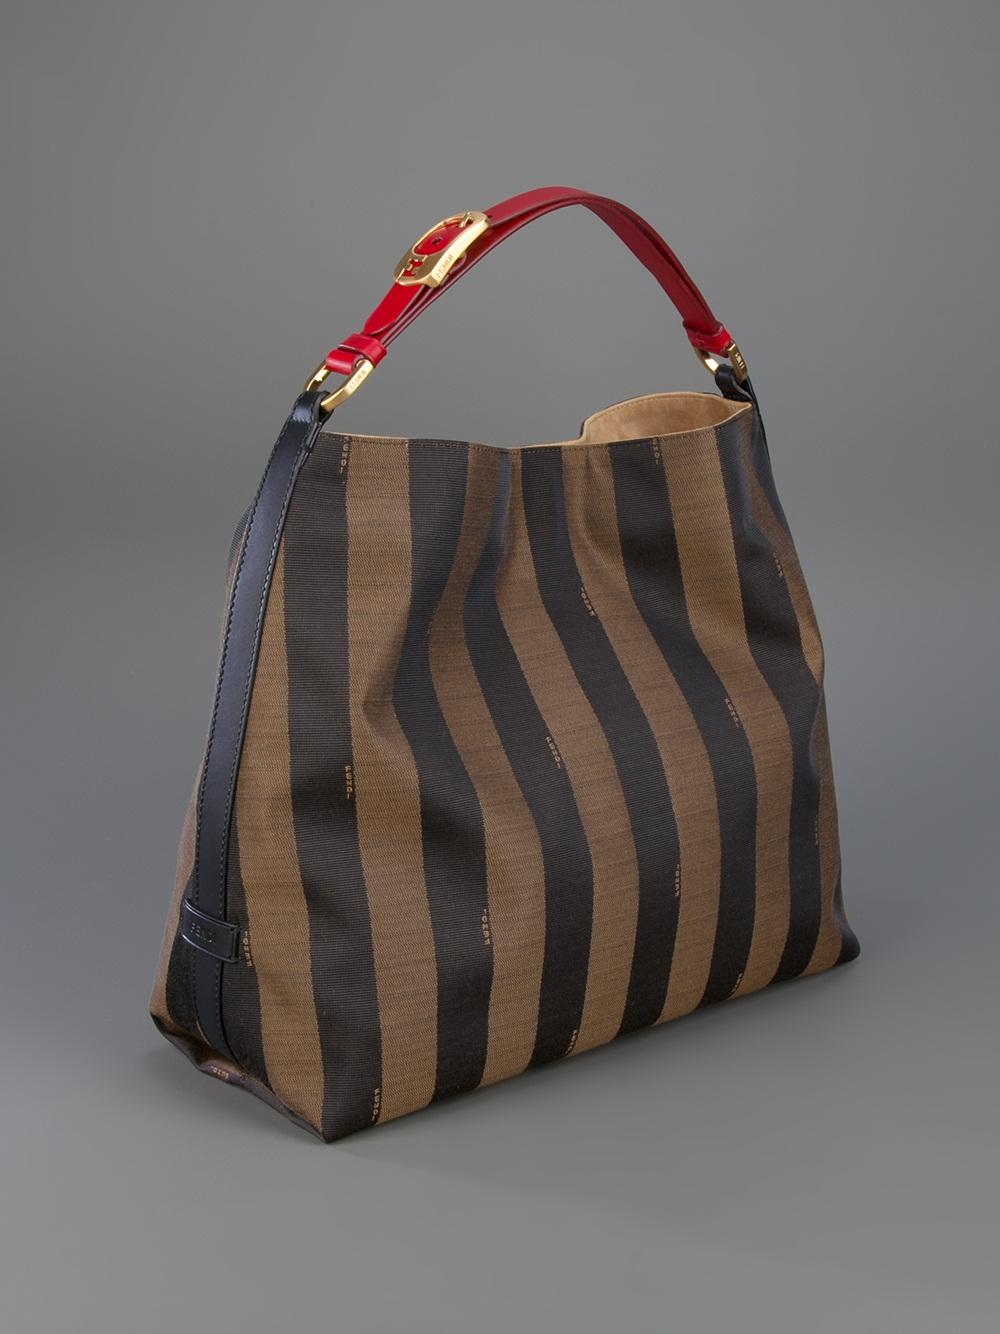 Fendi Pequin Bag In Brown Lyst